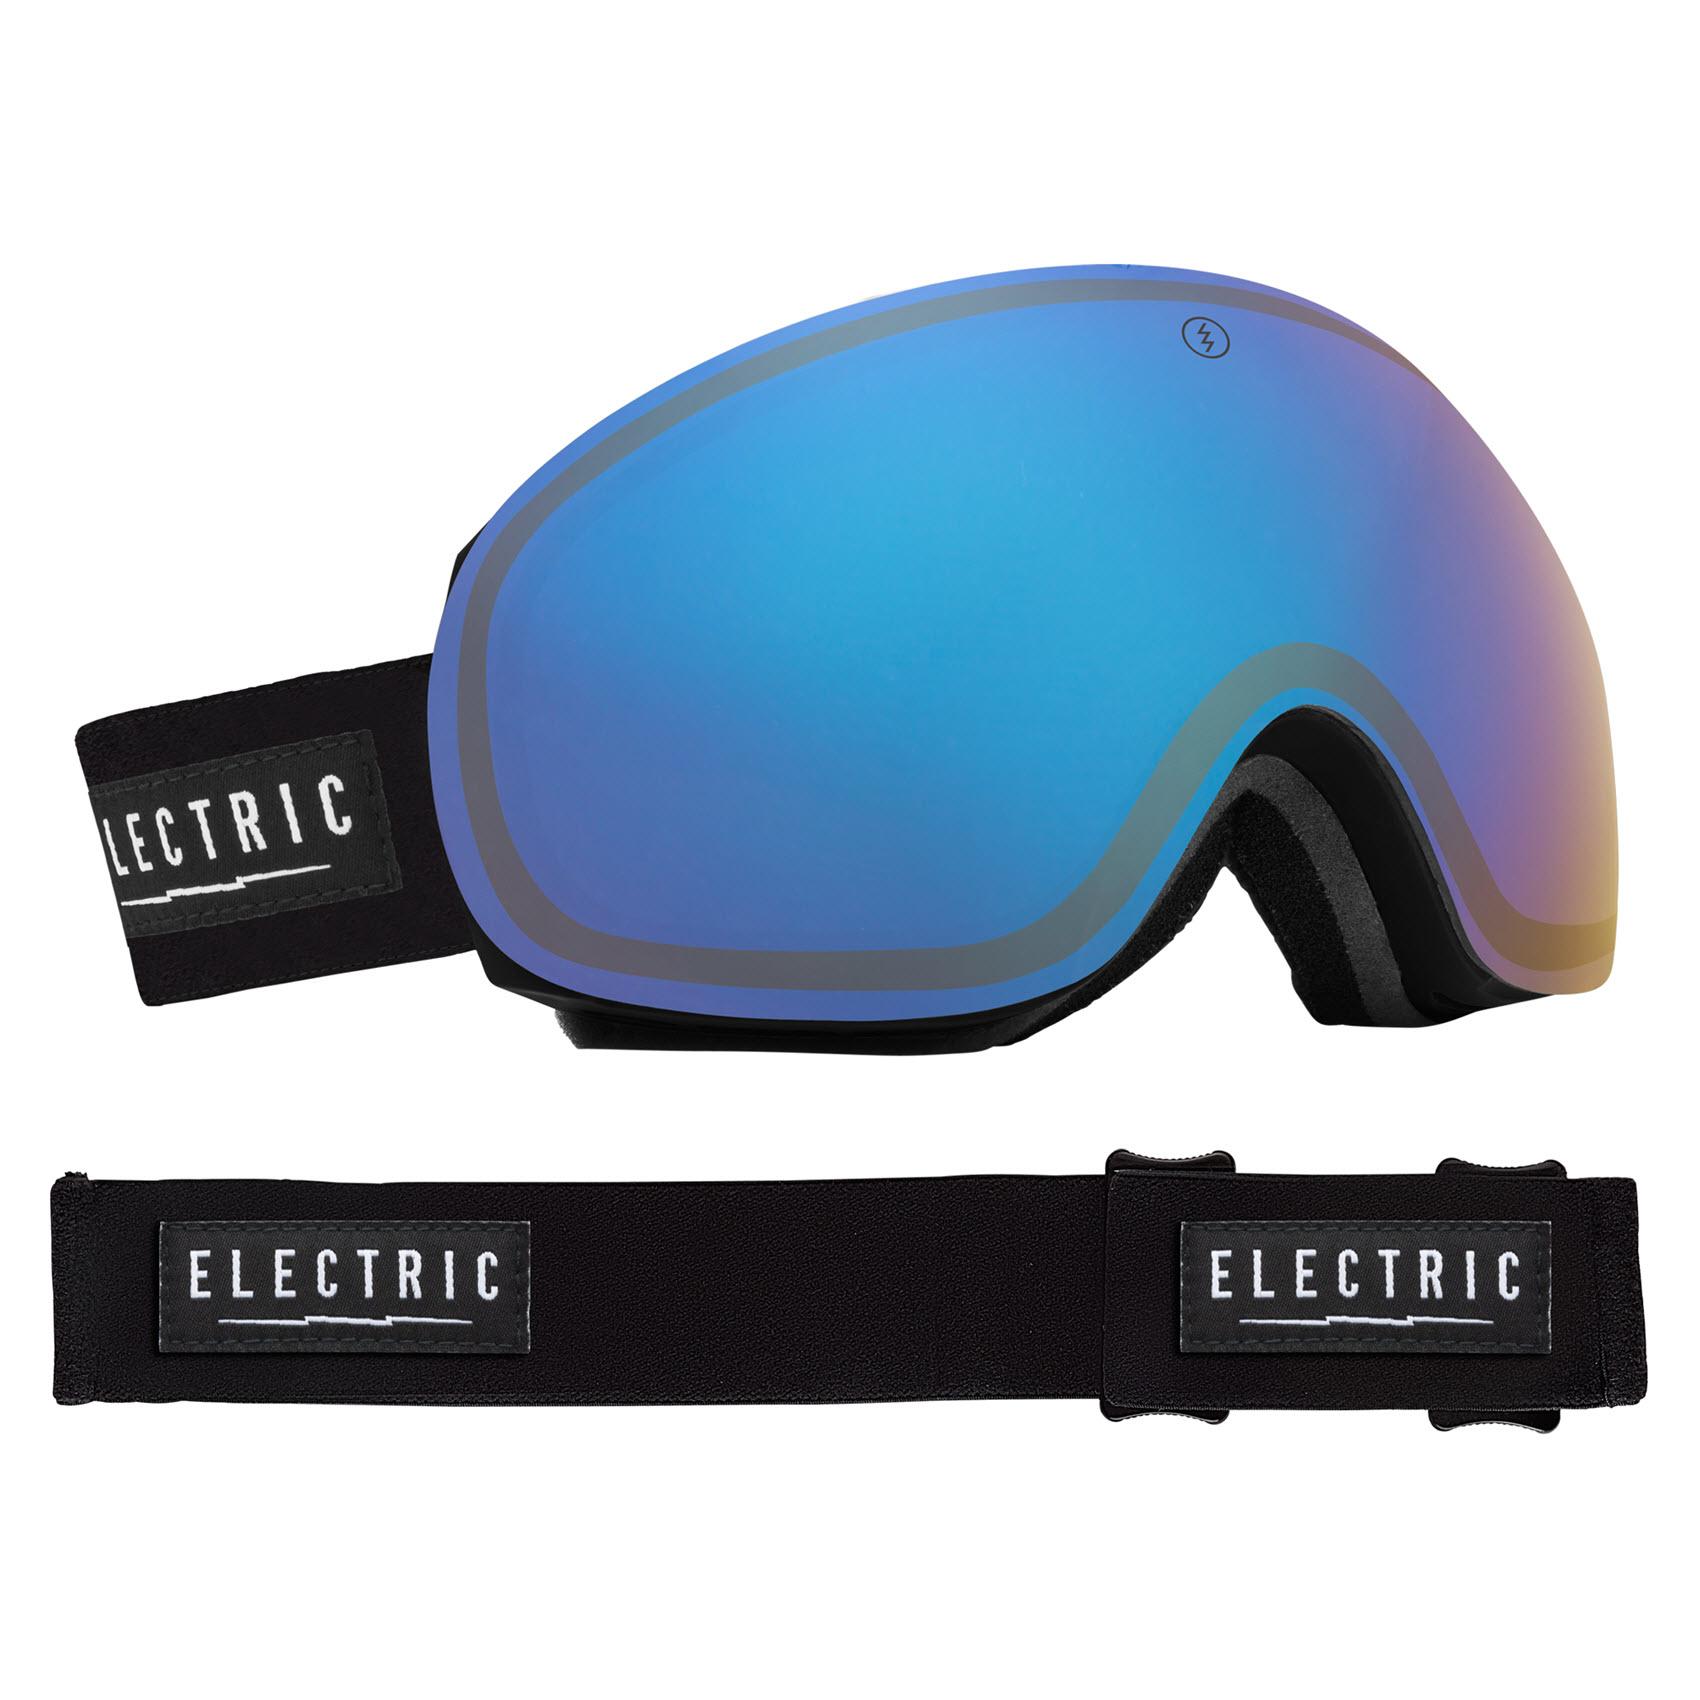 interchangeable ski goggles  Electric EG3 Snowboard Ski Goggles 2015 Frameless Interchangeable ...